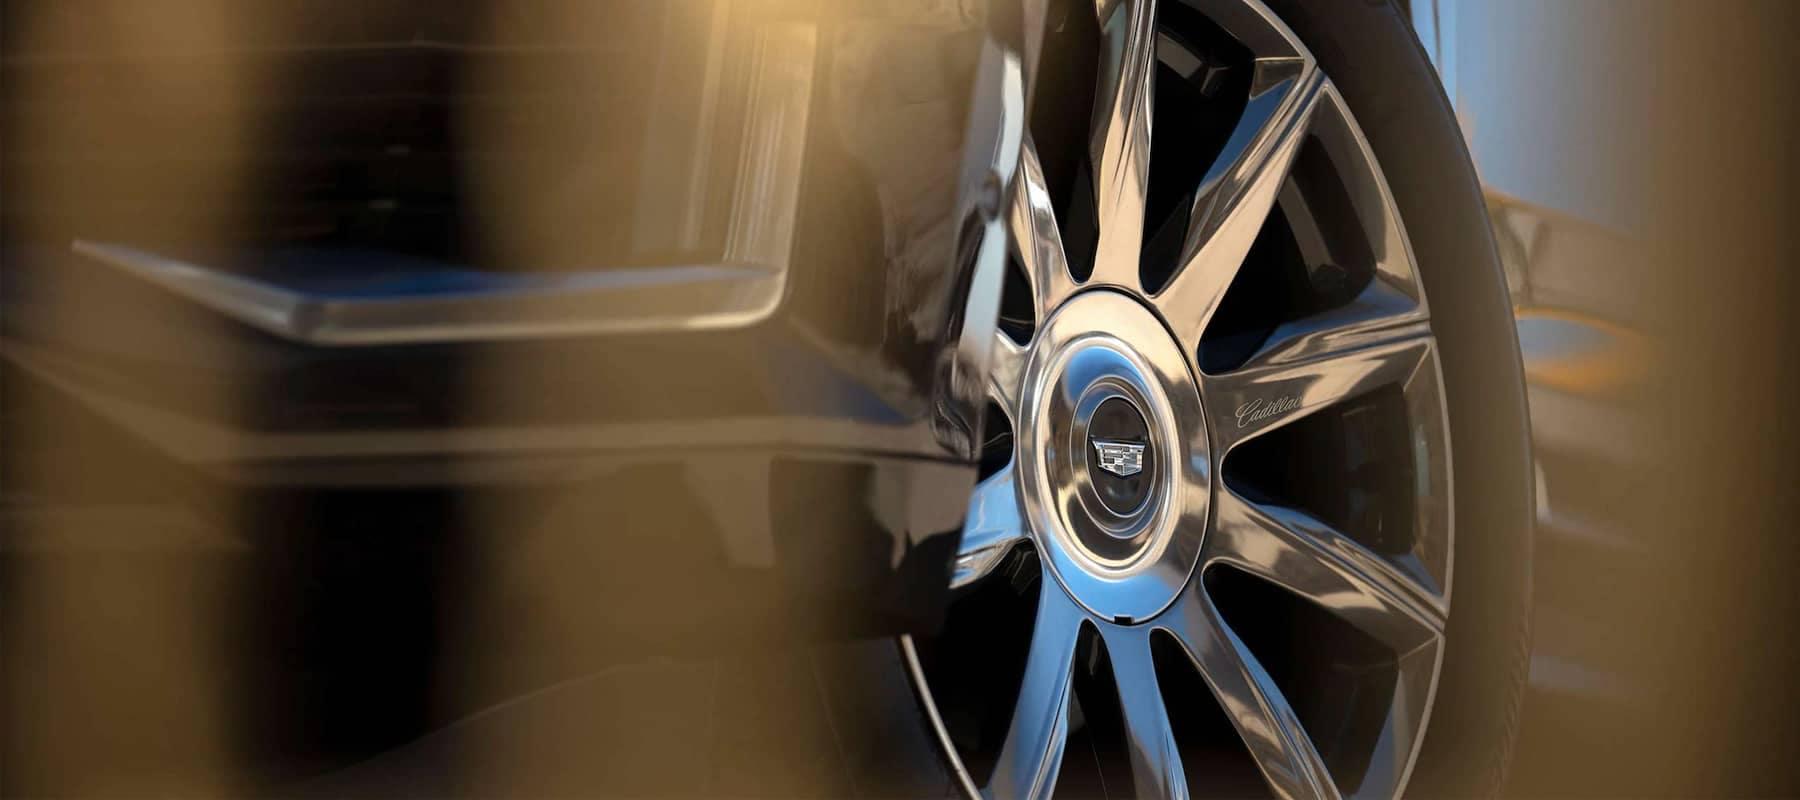 Close up view of Cadillac wheel and rim